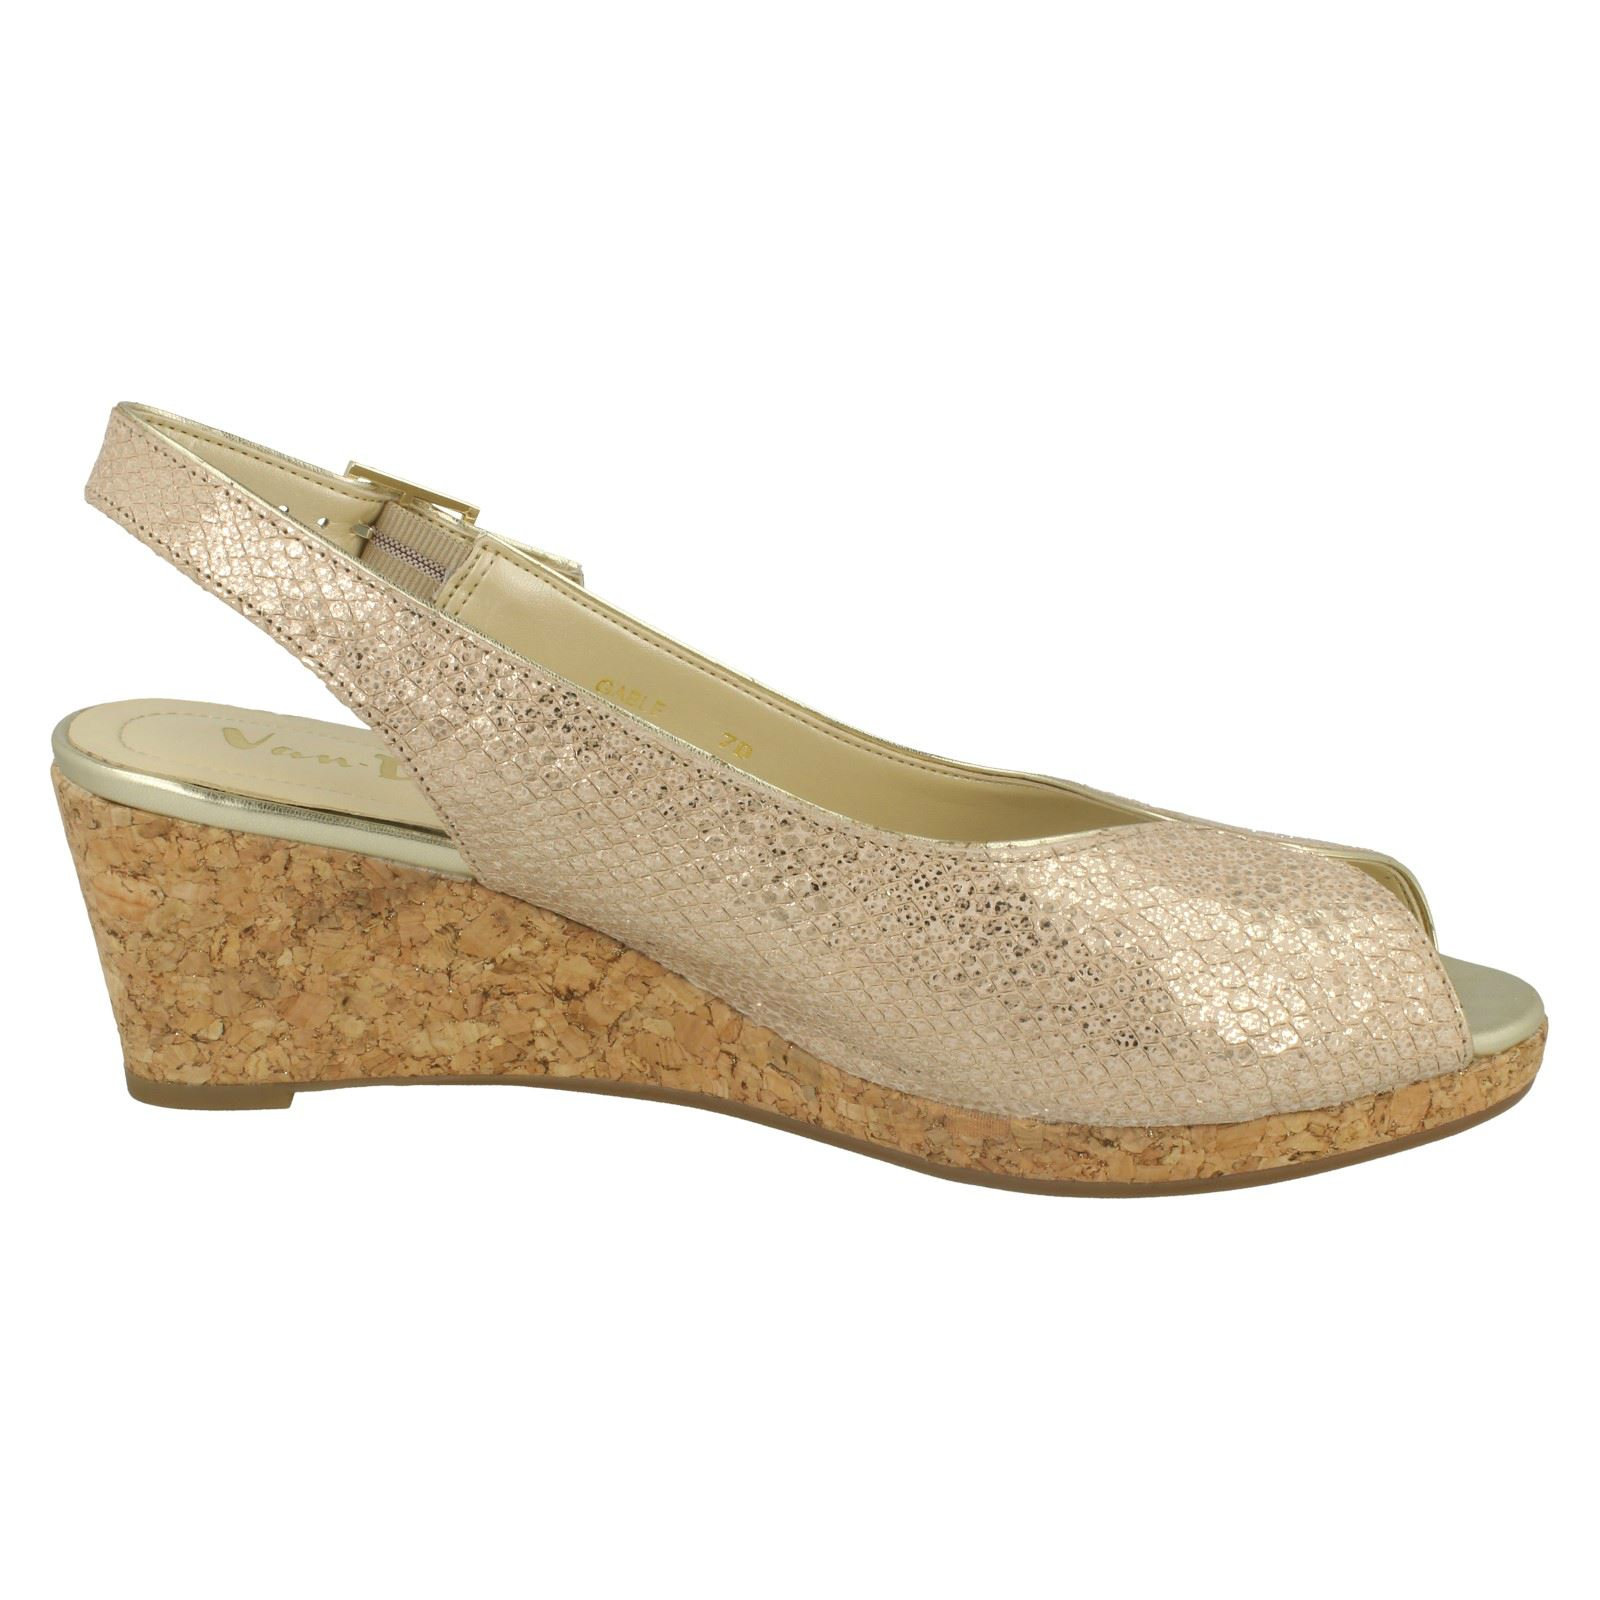 Ladies-Van-Dal-Cork-Wedge-Sandals-Gable thumbnail 6